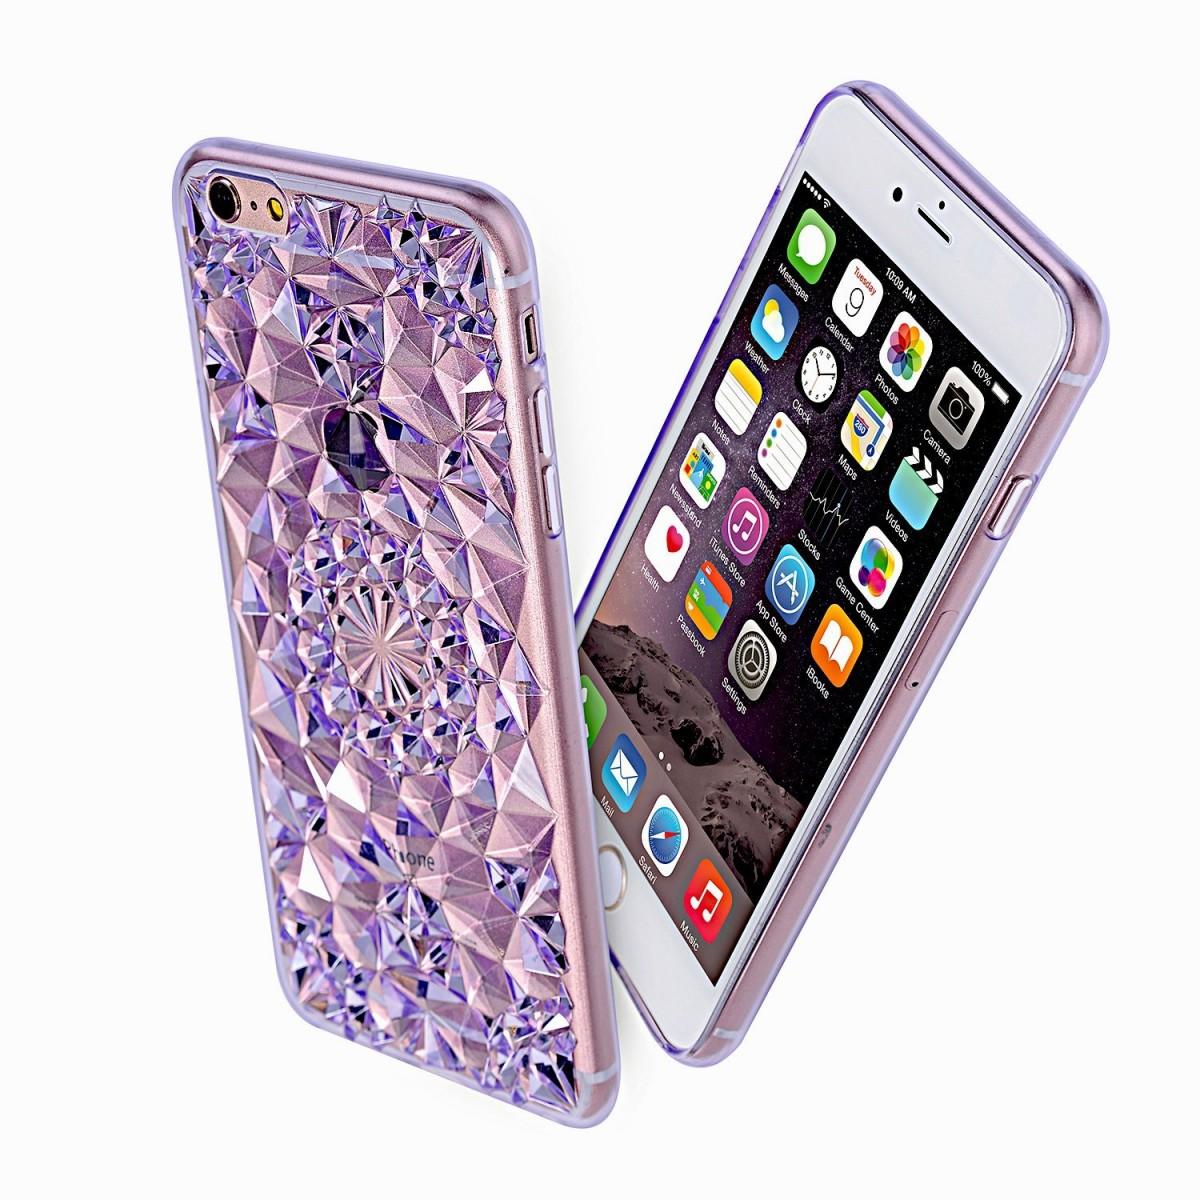 Kryt 3D Flowers & Crystals pro iPhone SE / 5s / 5 - Fialový